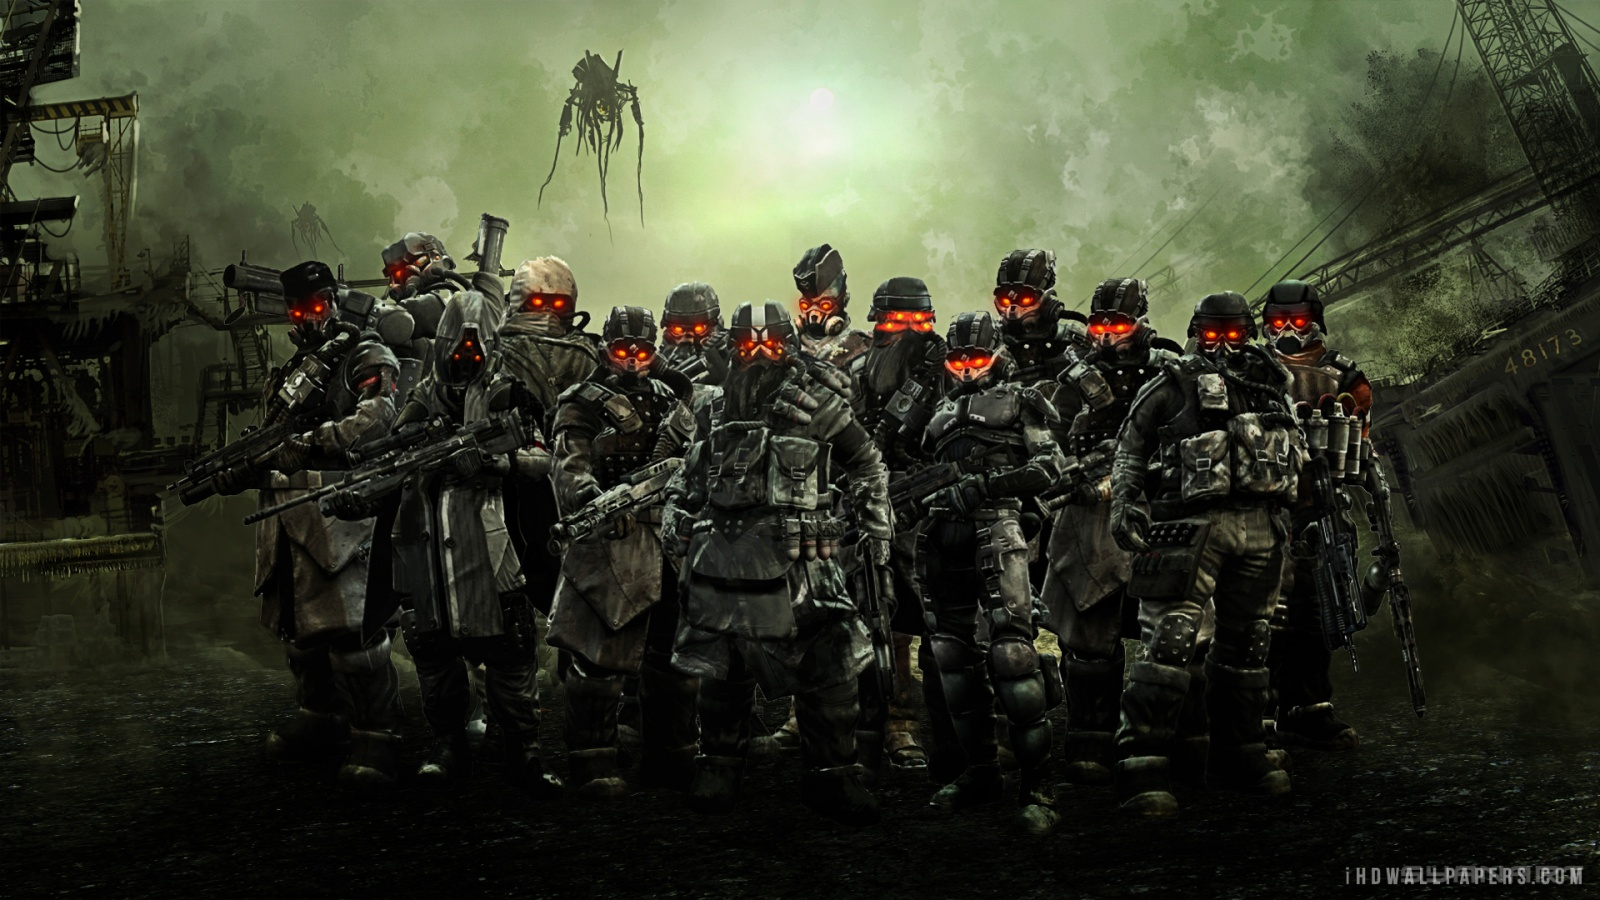 14 best images about <b>Killzone</b> .. on Pinterest | A well, Cyberpunk ...